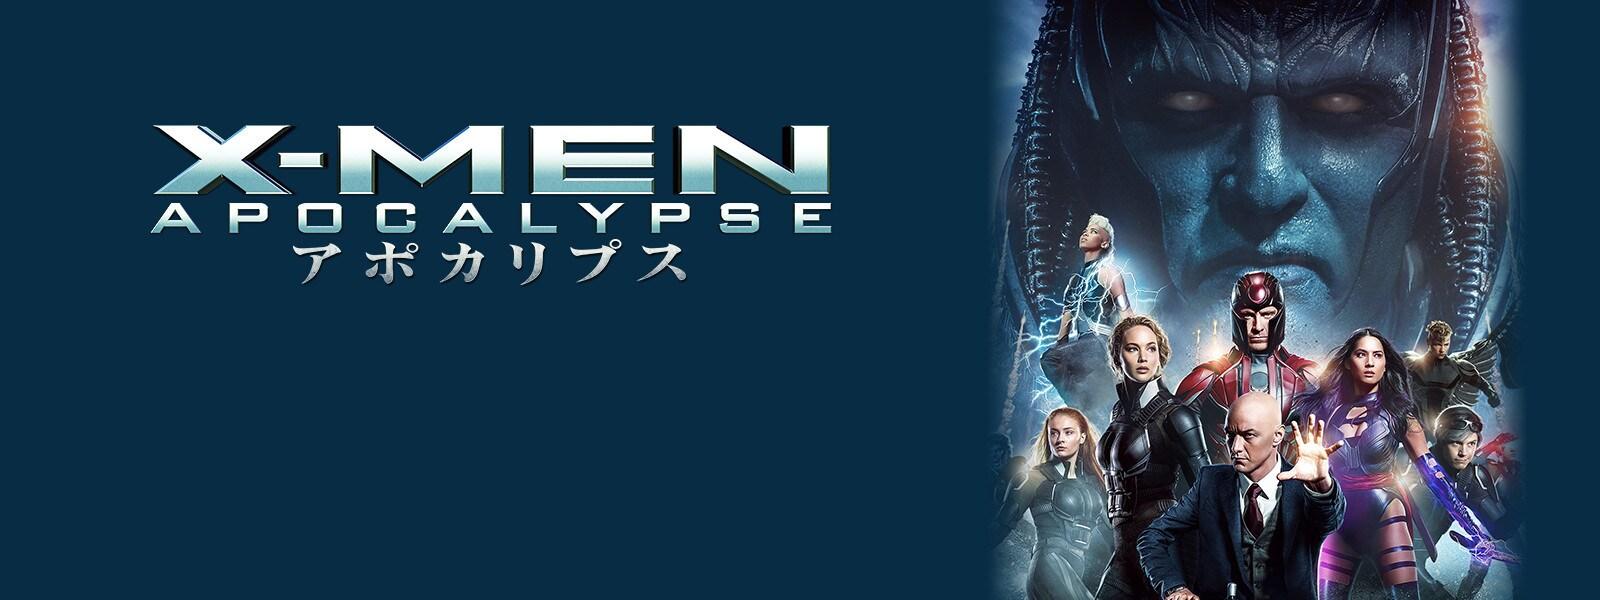 X-MEN:アポカリプス X-Men: Apocalypse Hero